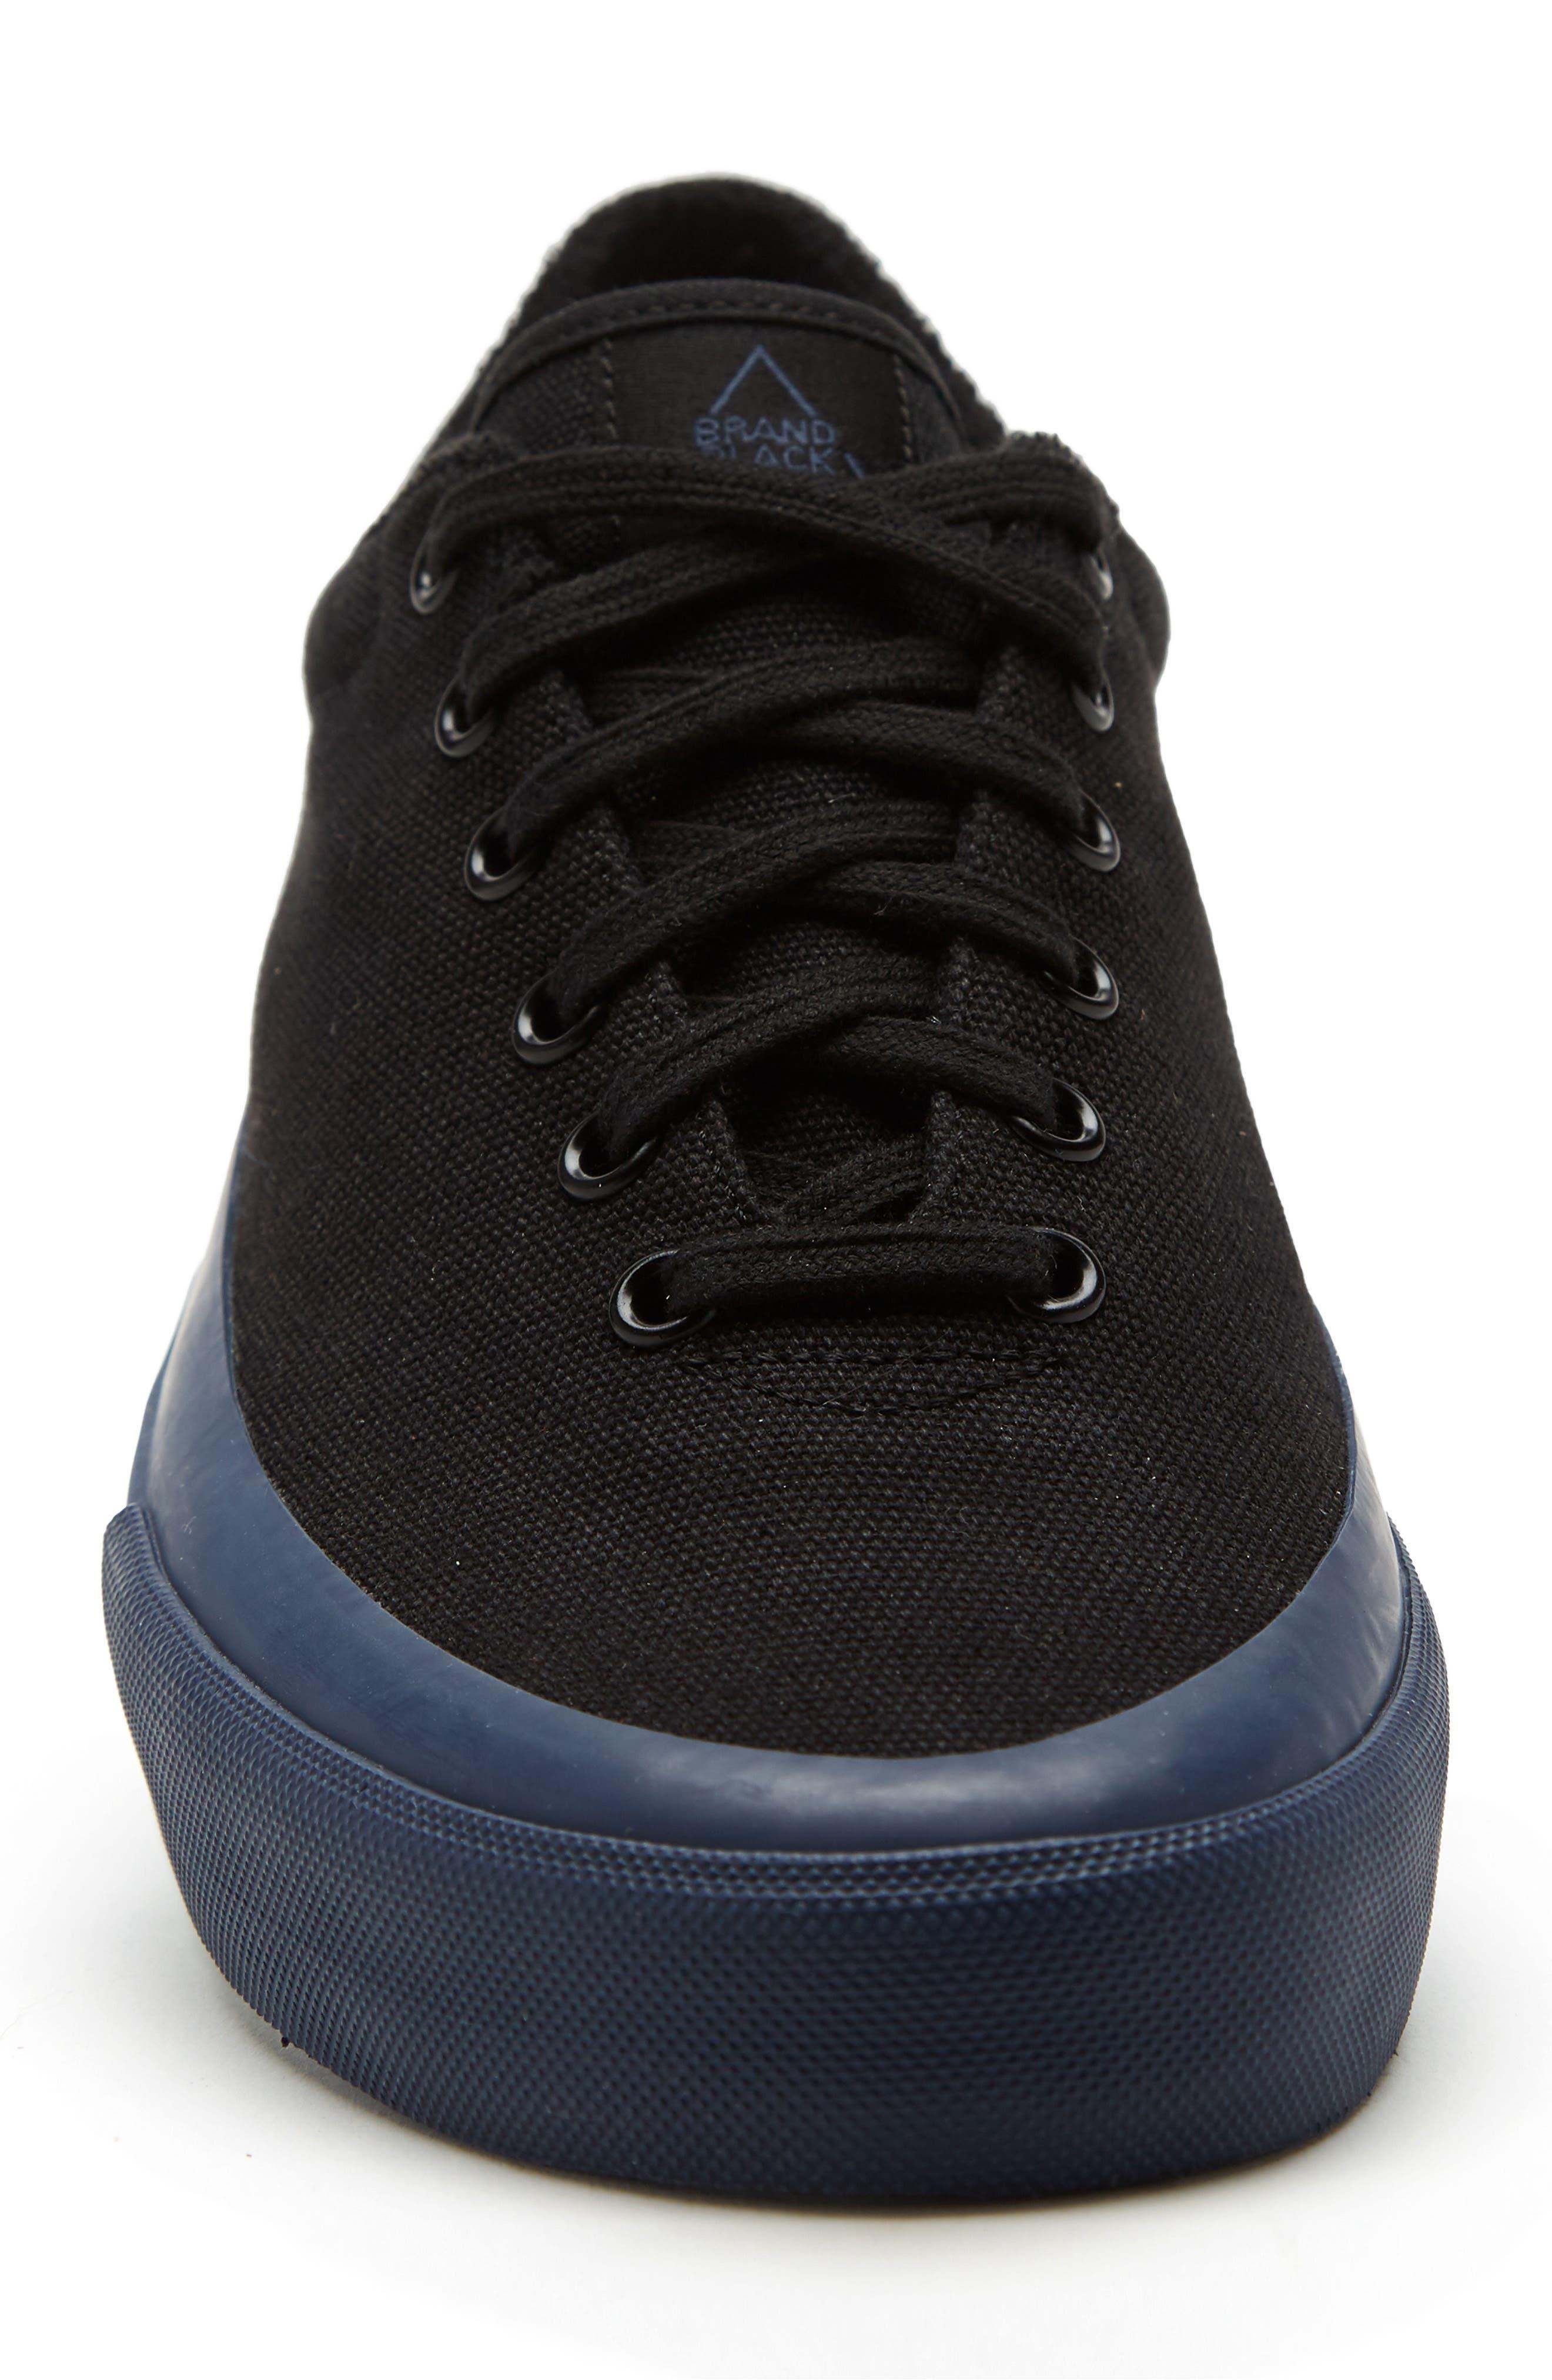 Vesta Low Top Sneaker,                             Alternate thumbnail 4, color,                             BLACK/ NAVY